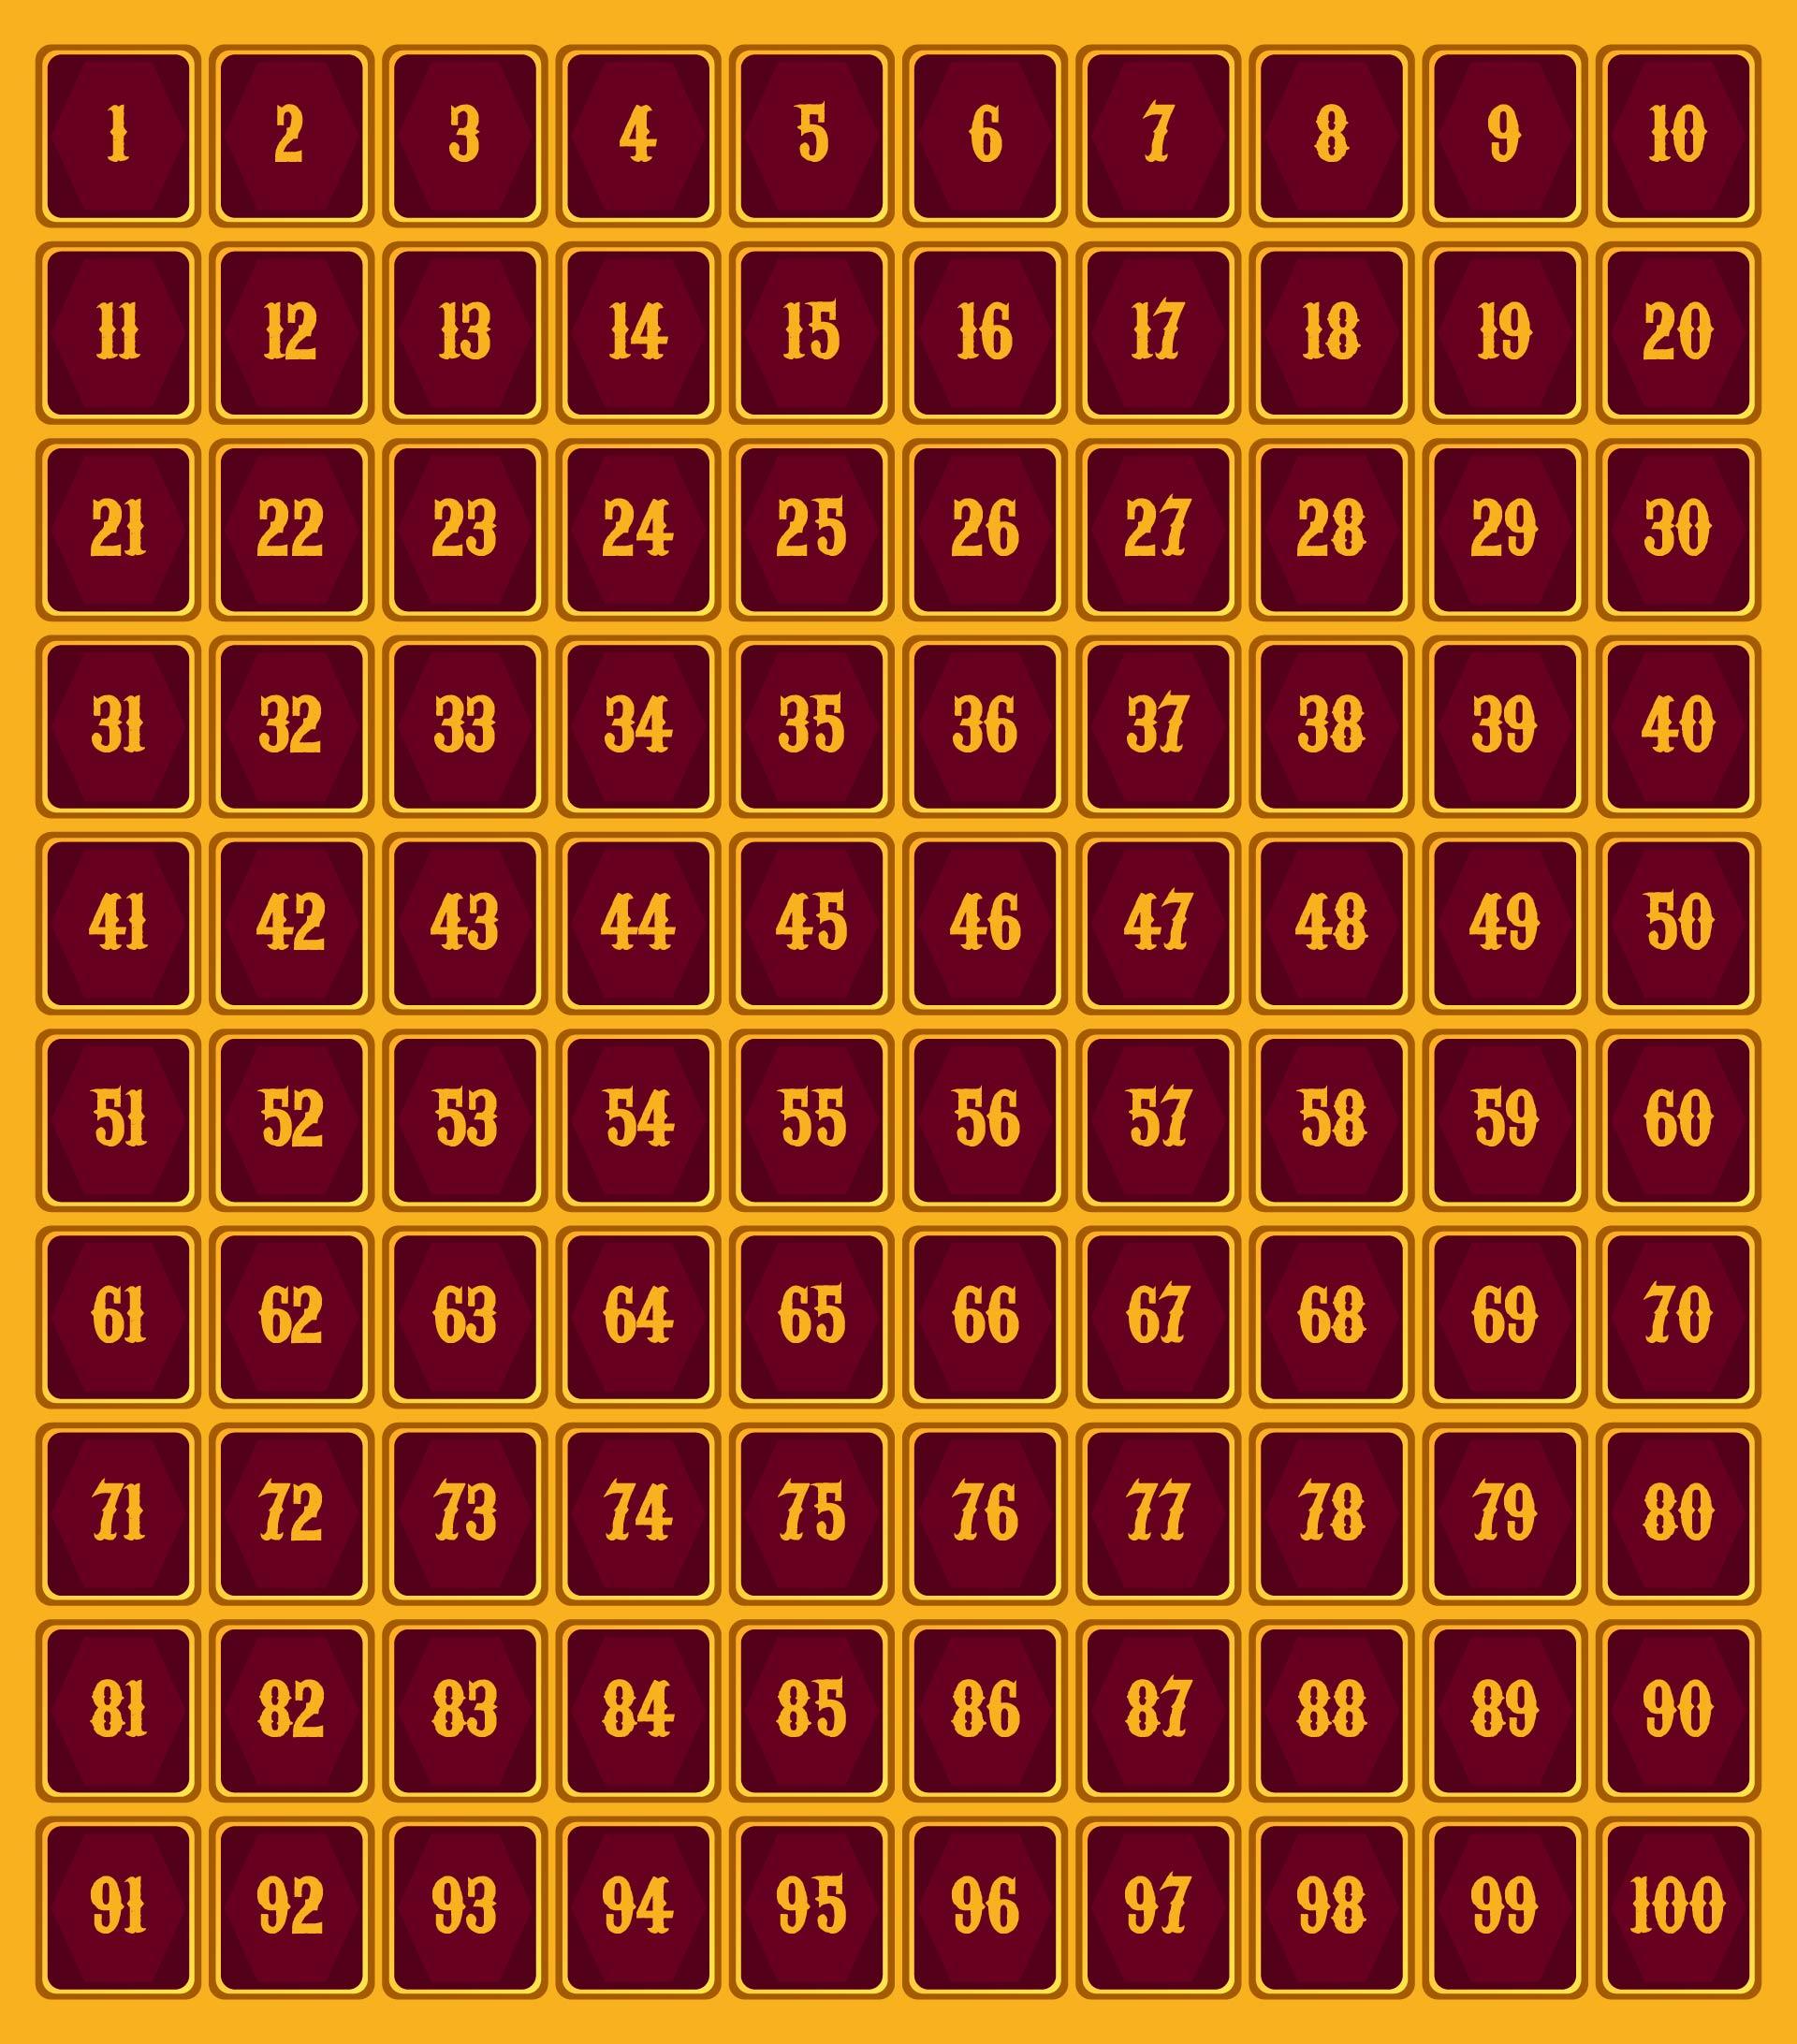 Number Flashcards 1 100 Printable